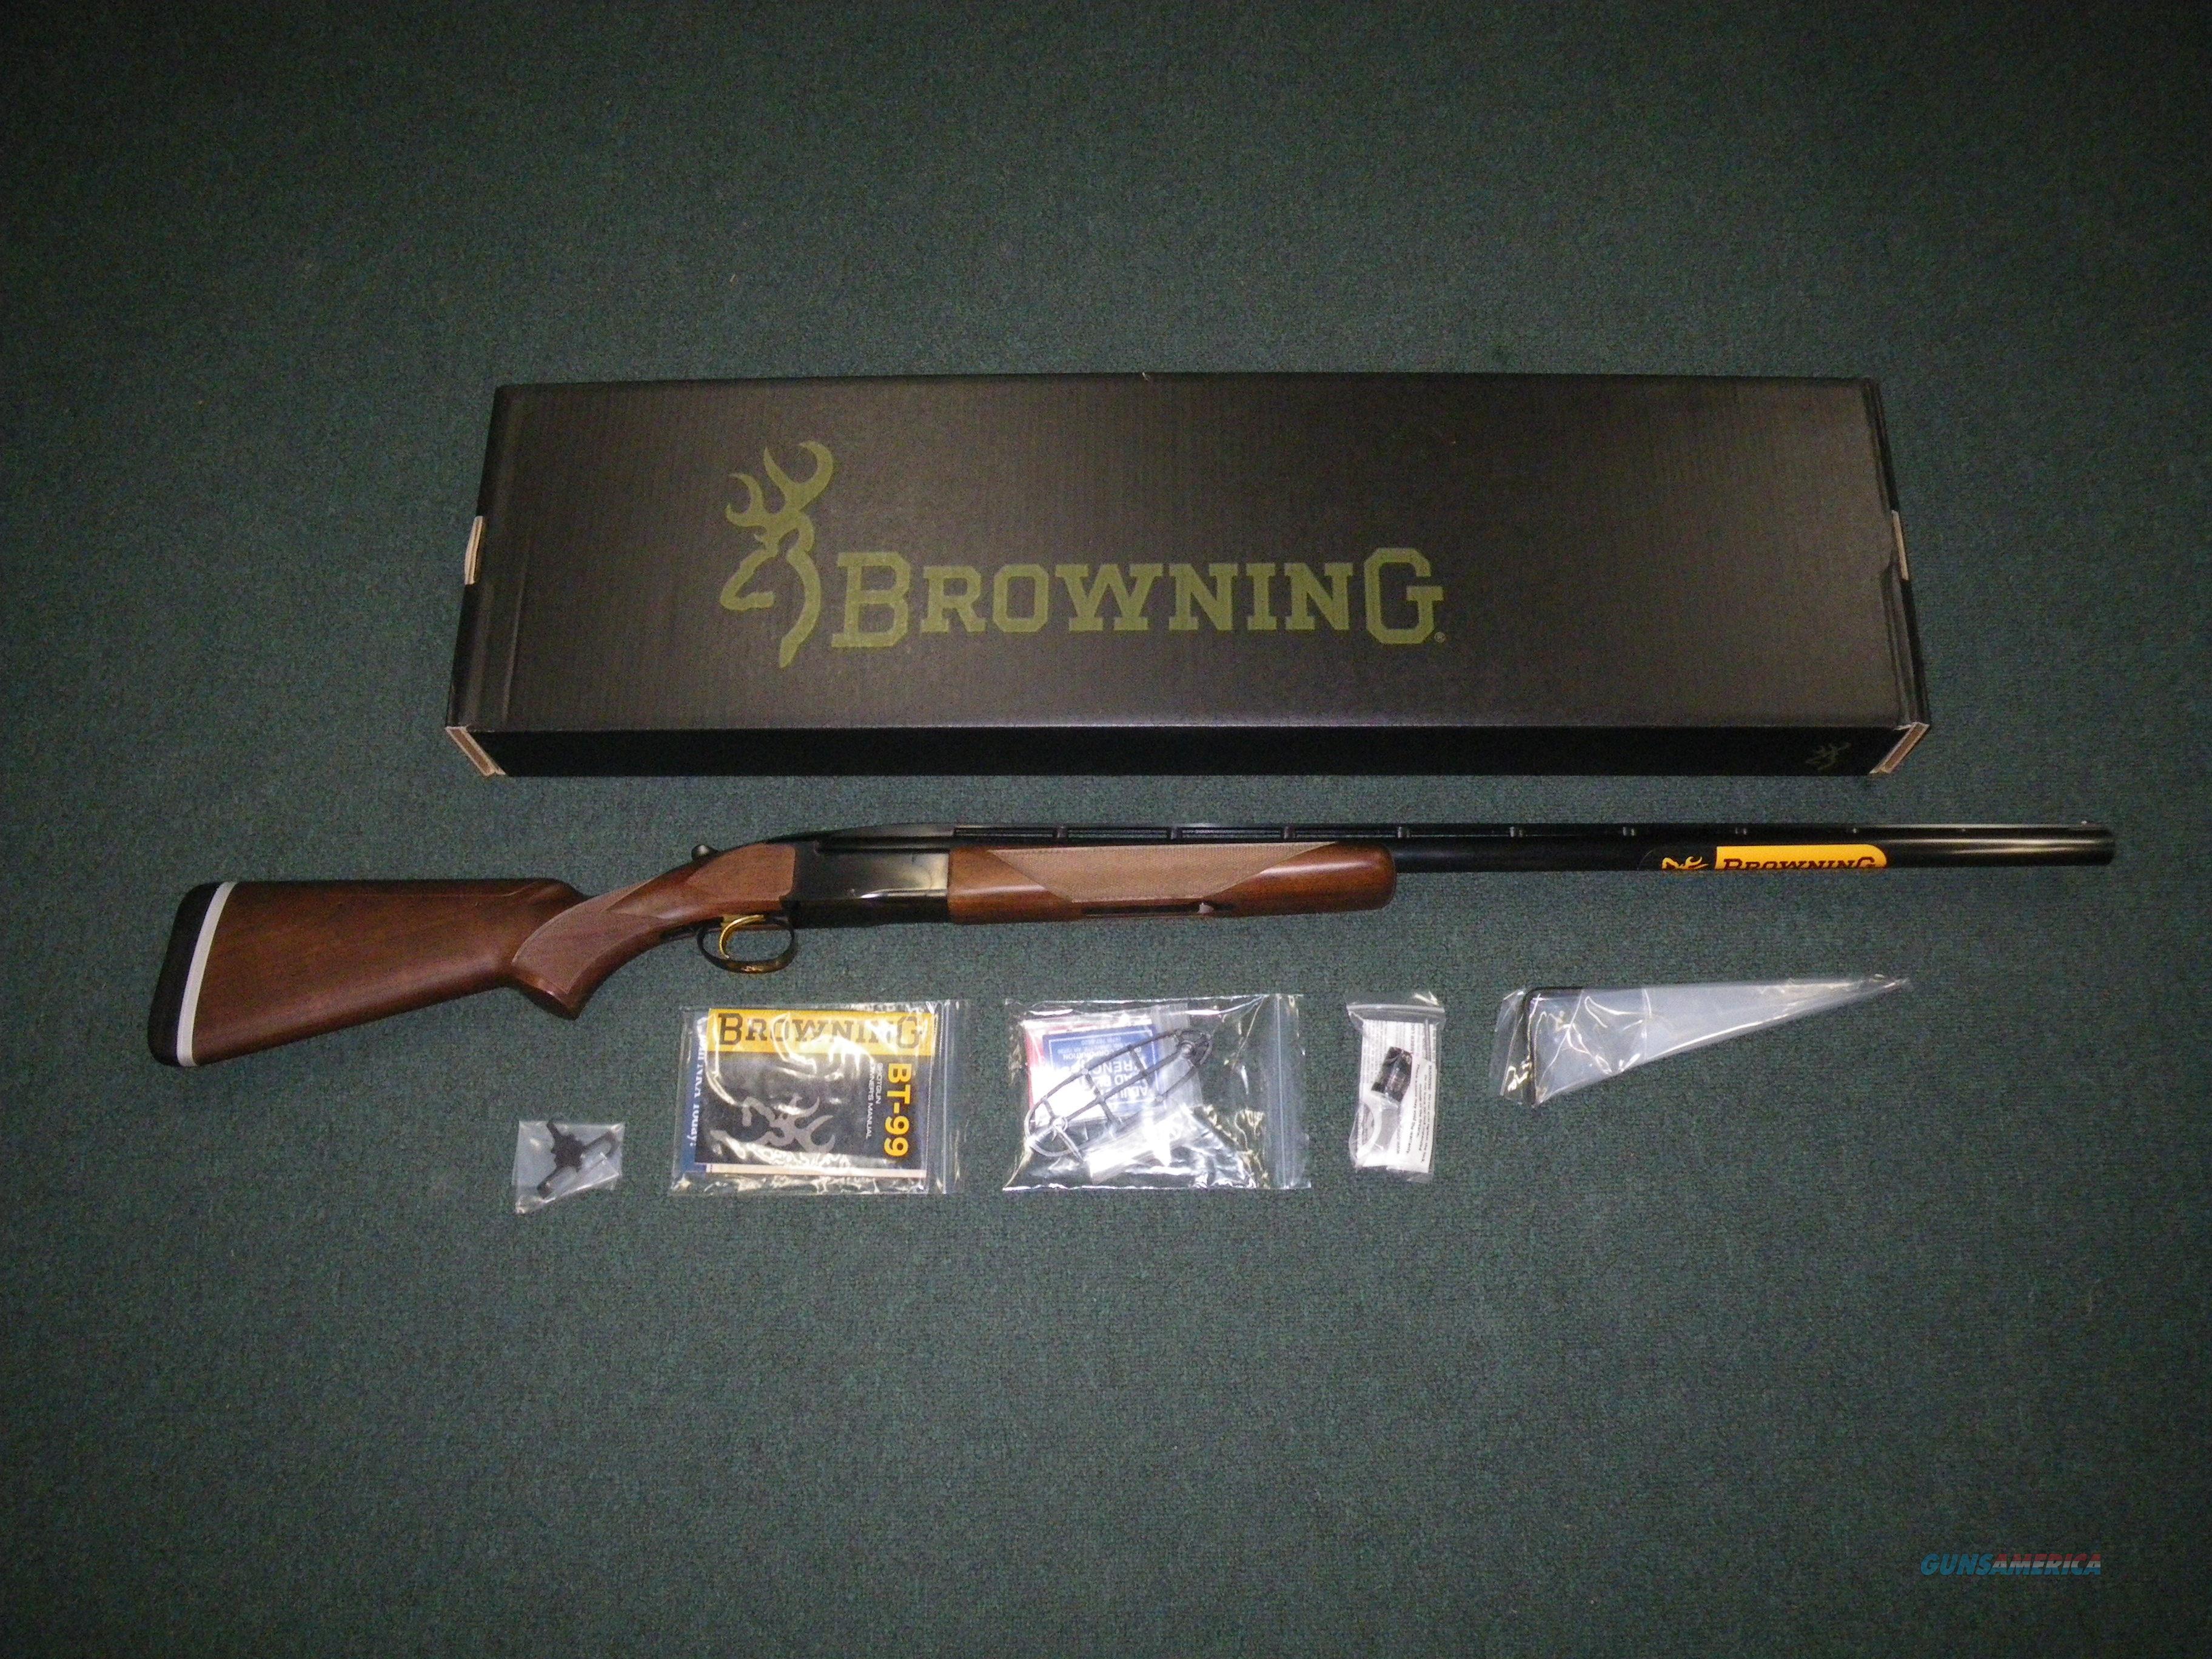 "Browning BT-99 Adjustable Comb 12ga 34"" 2-3/4"" NEW #017081401  Guns > Shotguns > Browning Shotguns > Single Barrel"